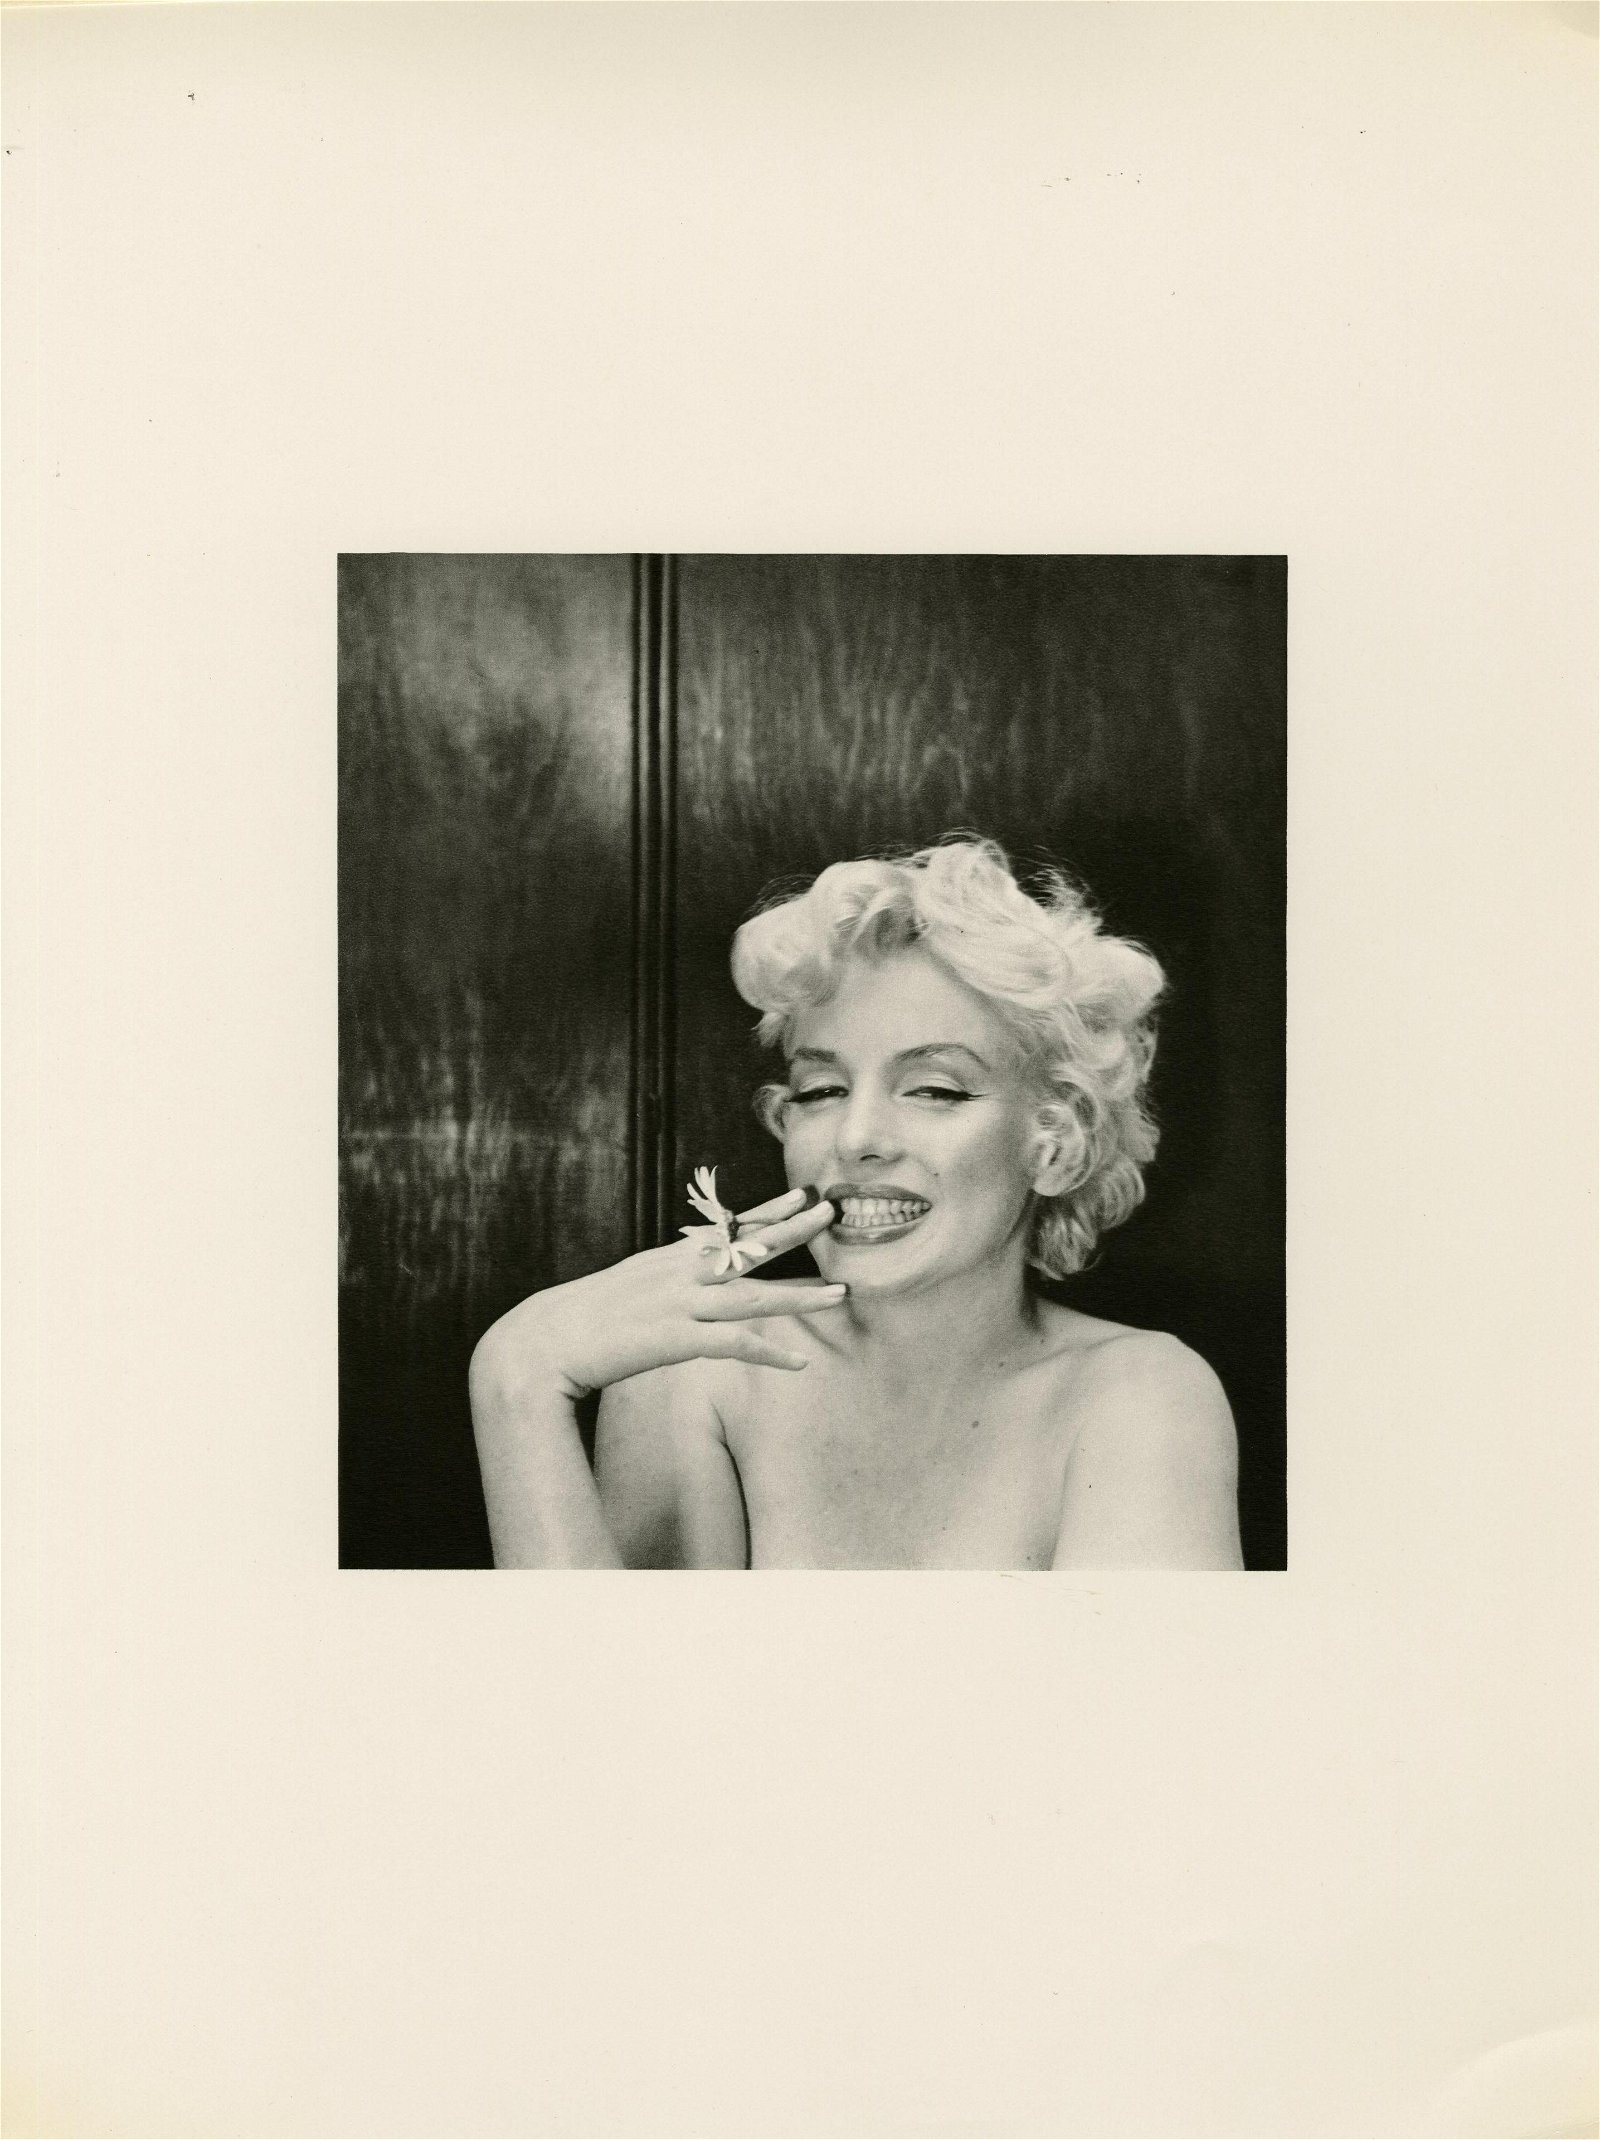 CECIL BEATON - Marilyn Monroe 1956 #1 - Original